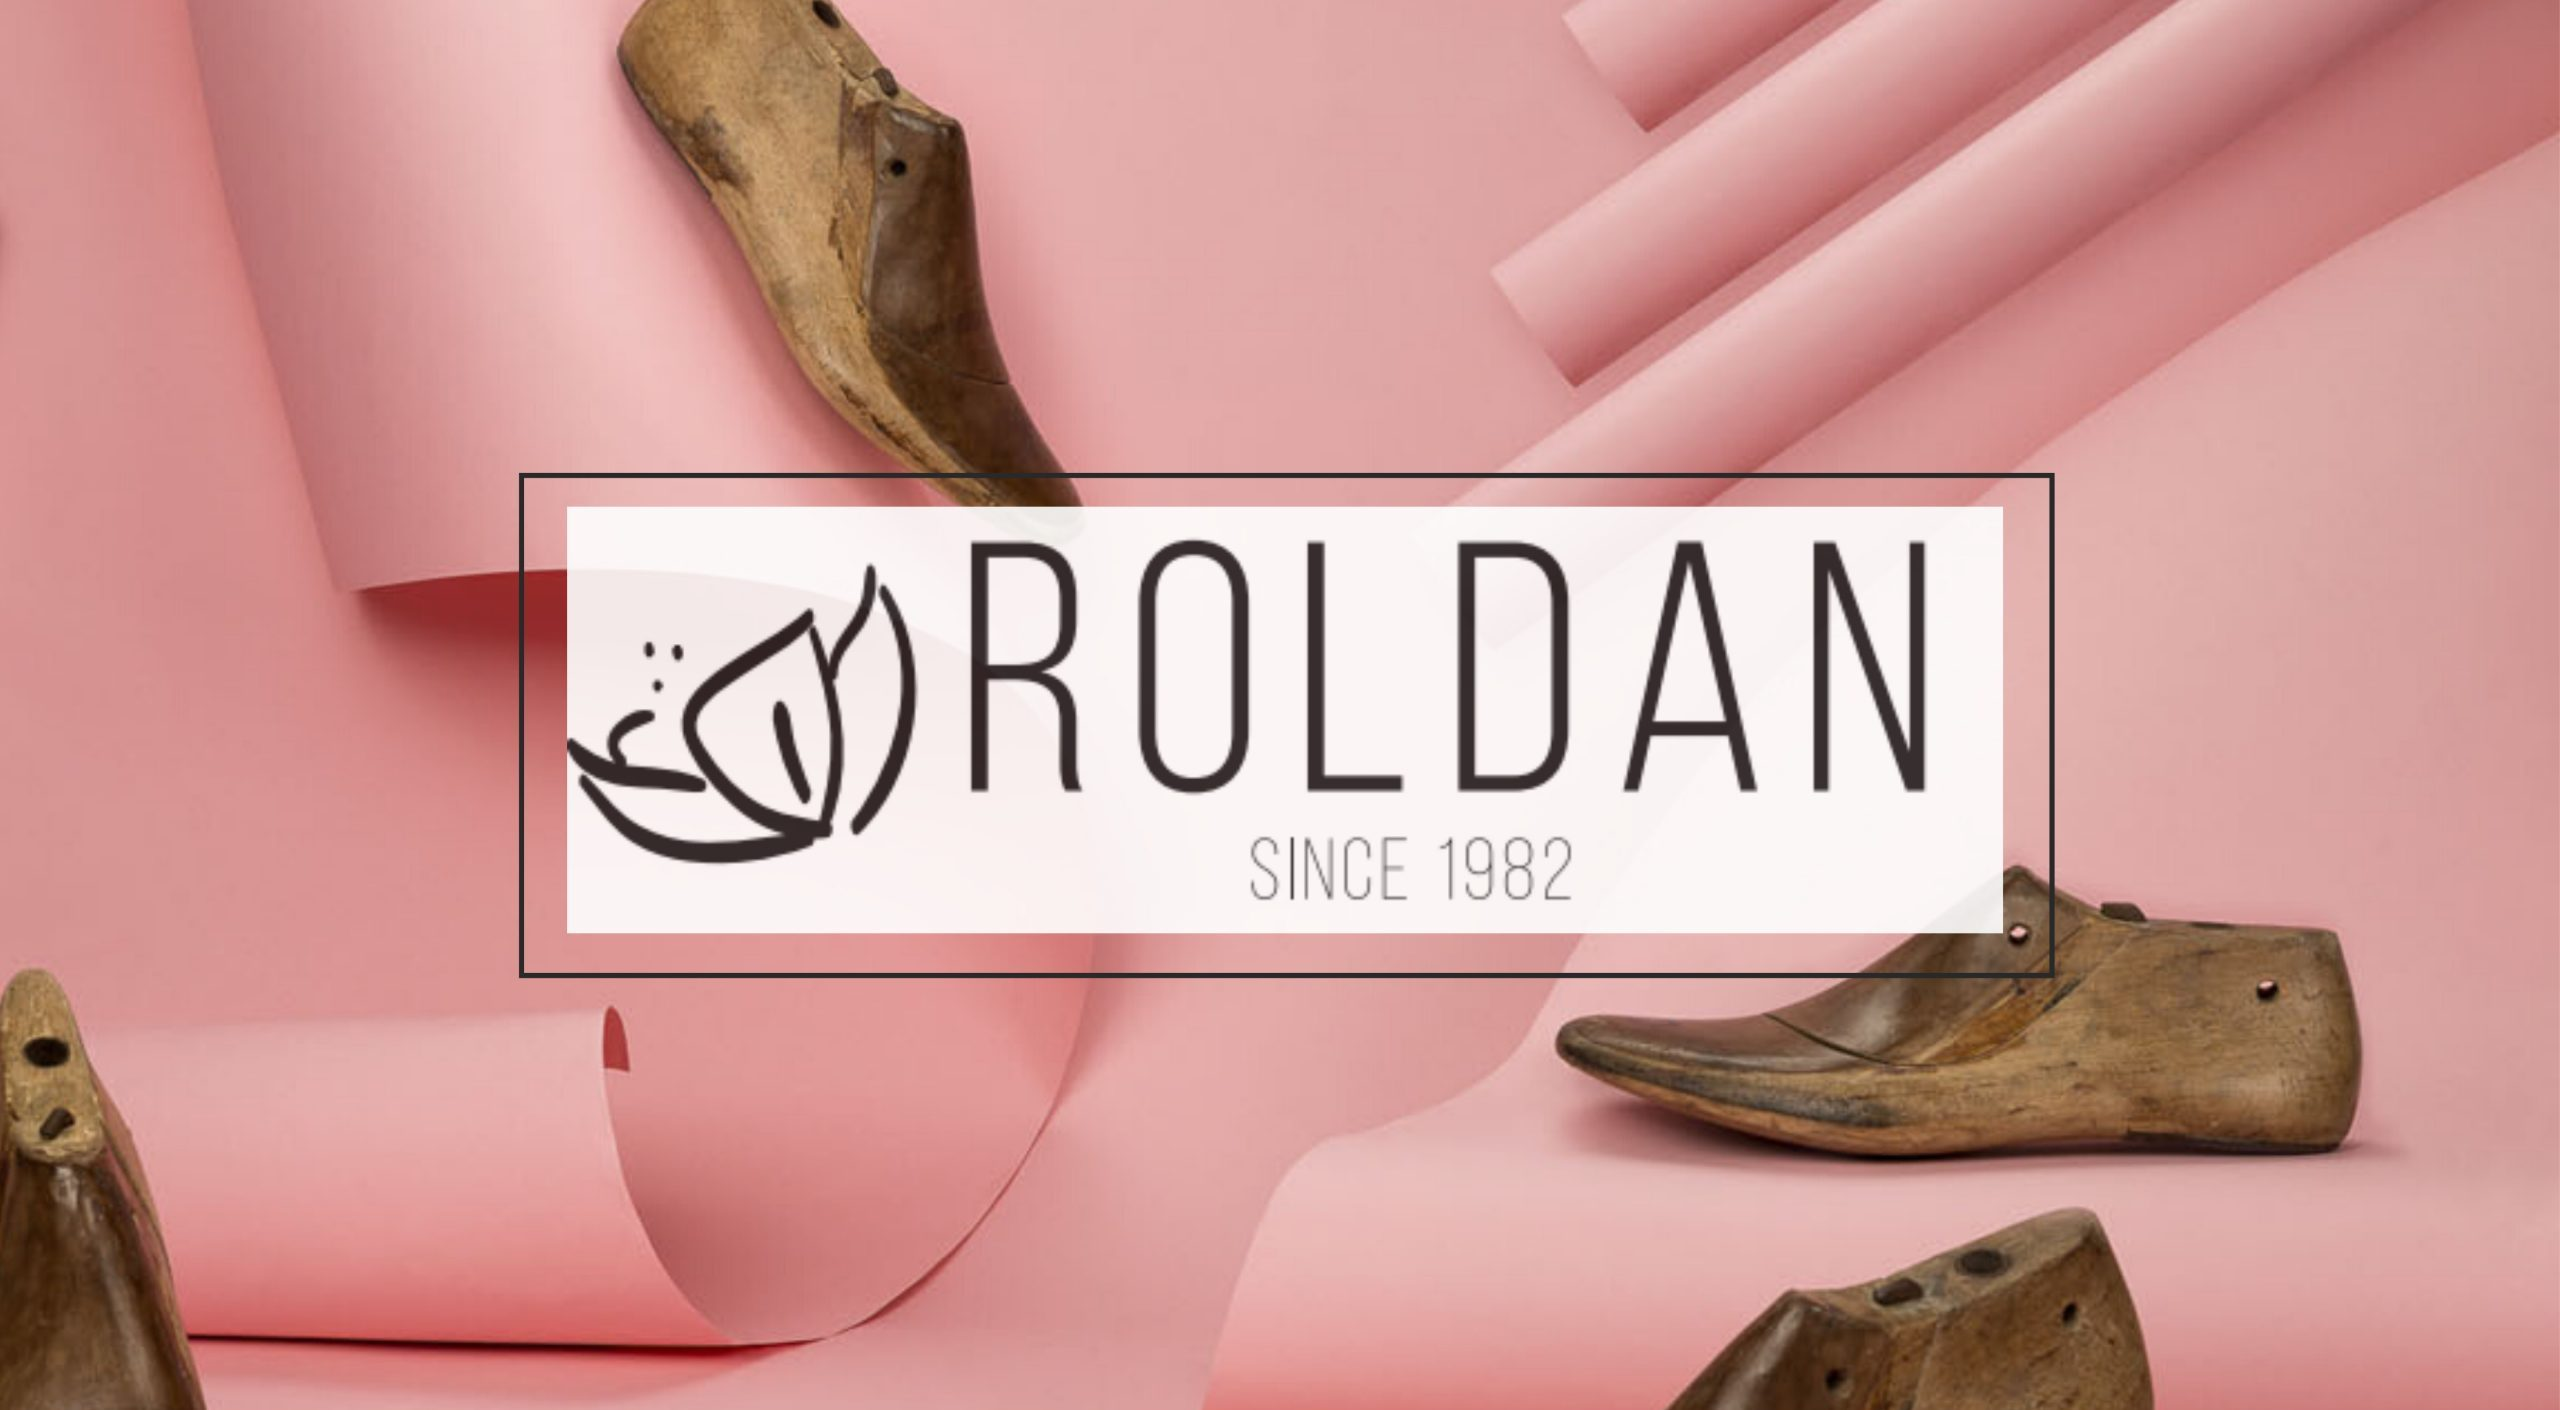 CALZADOS ROLDAN